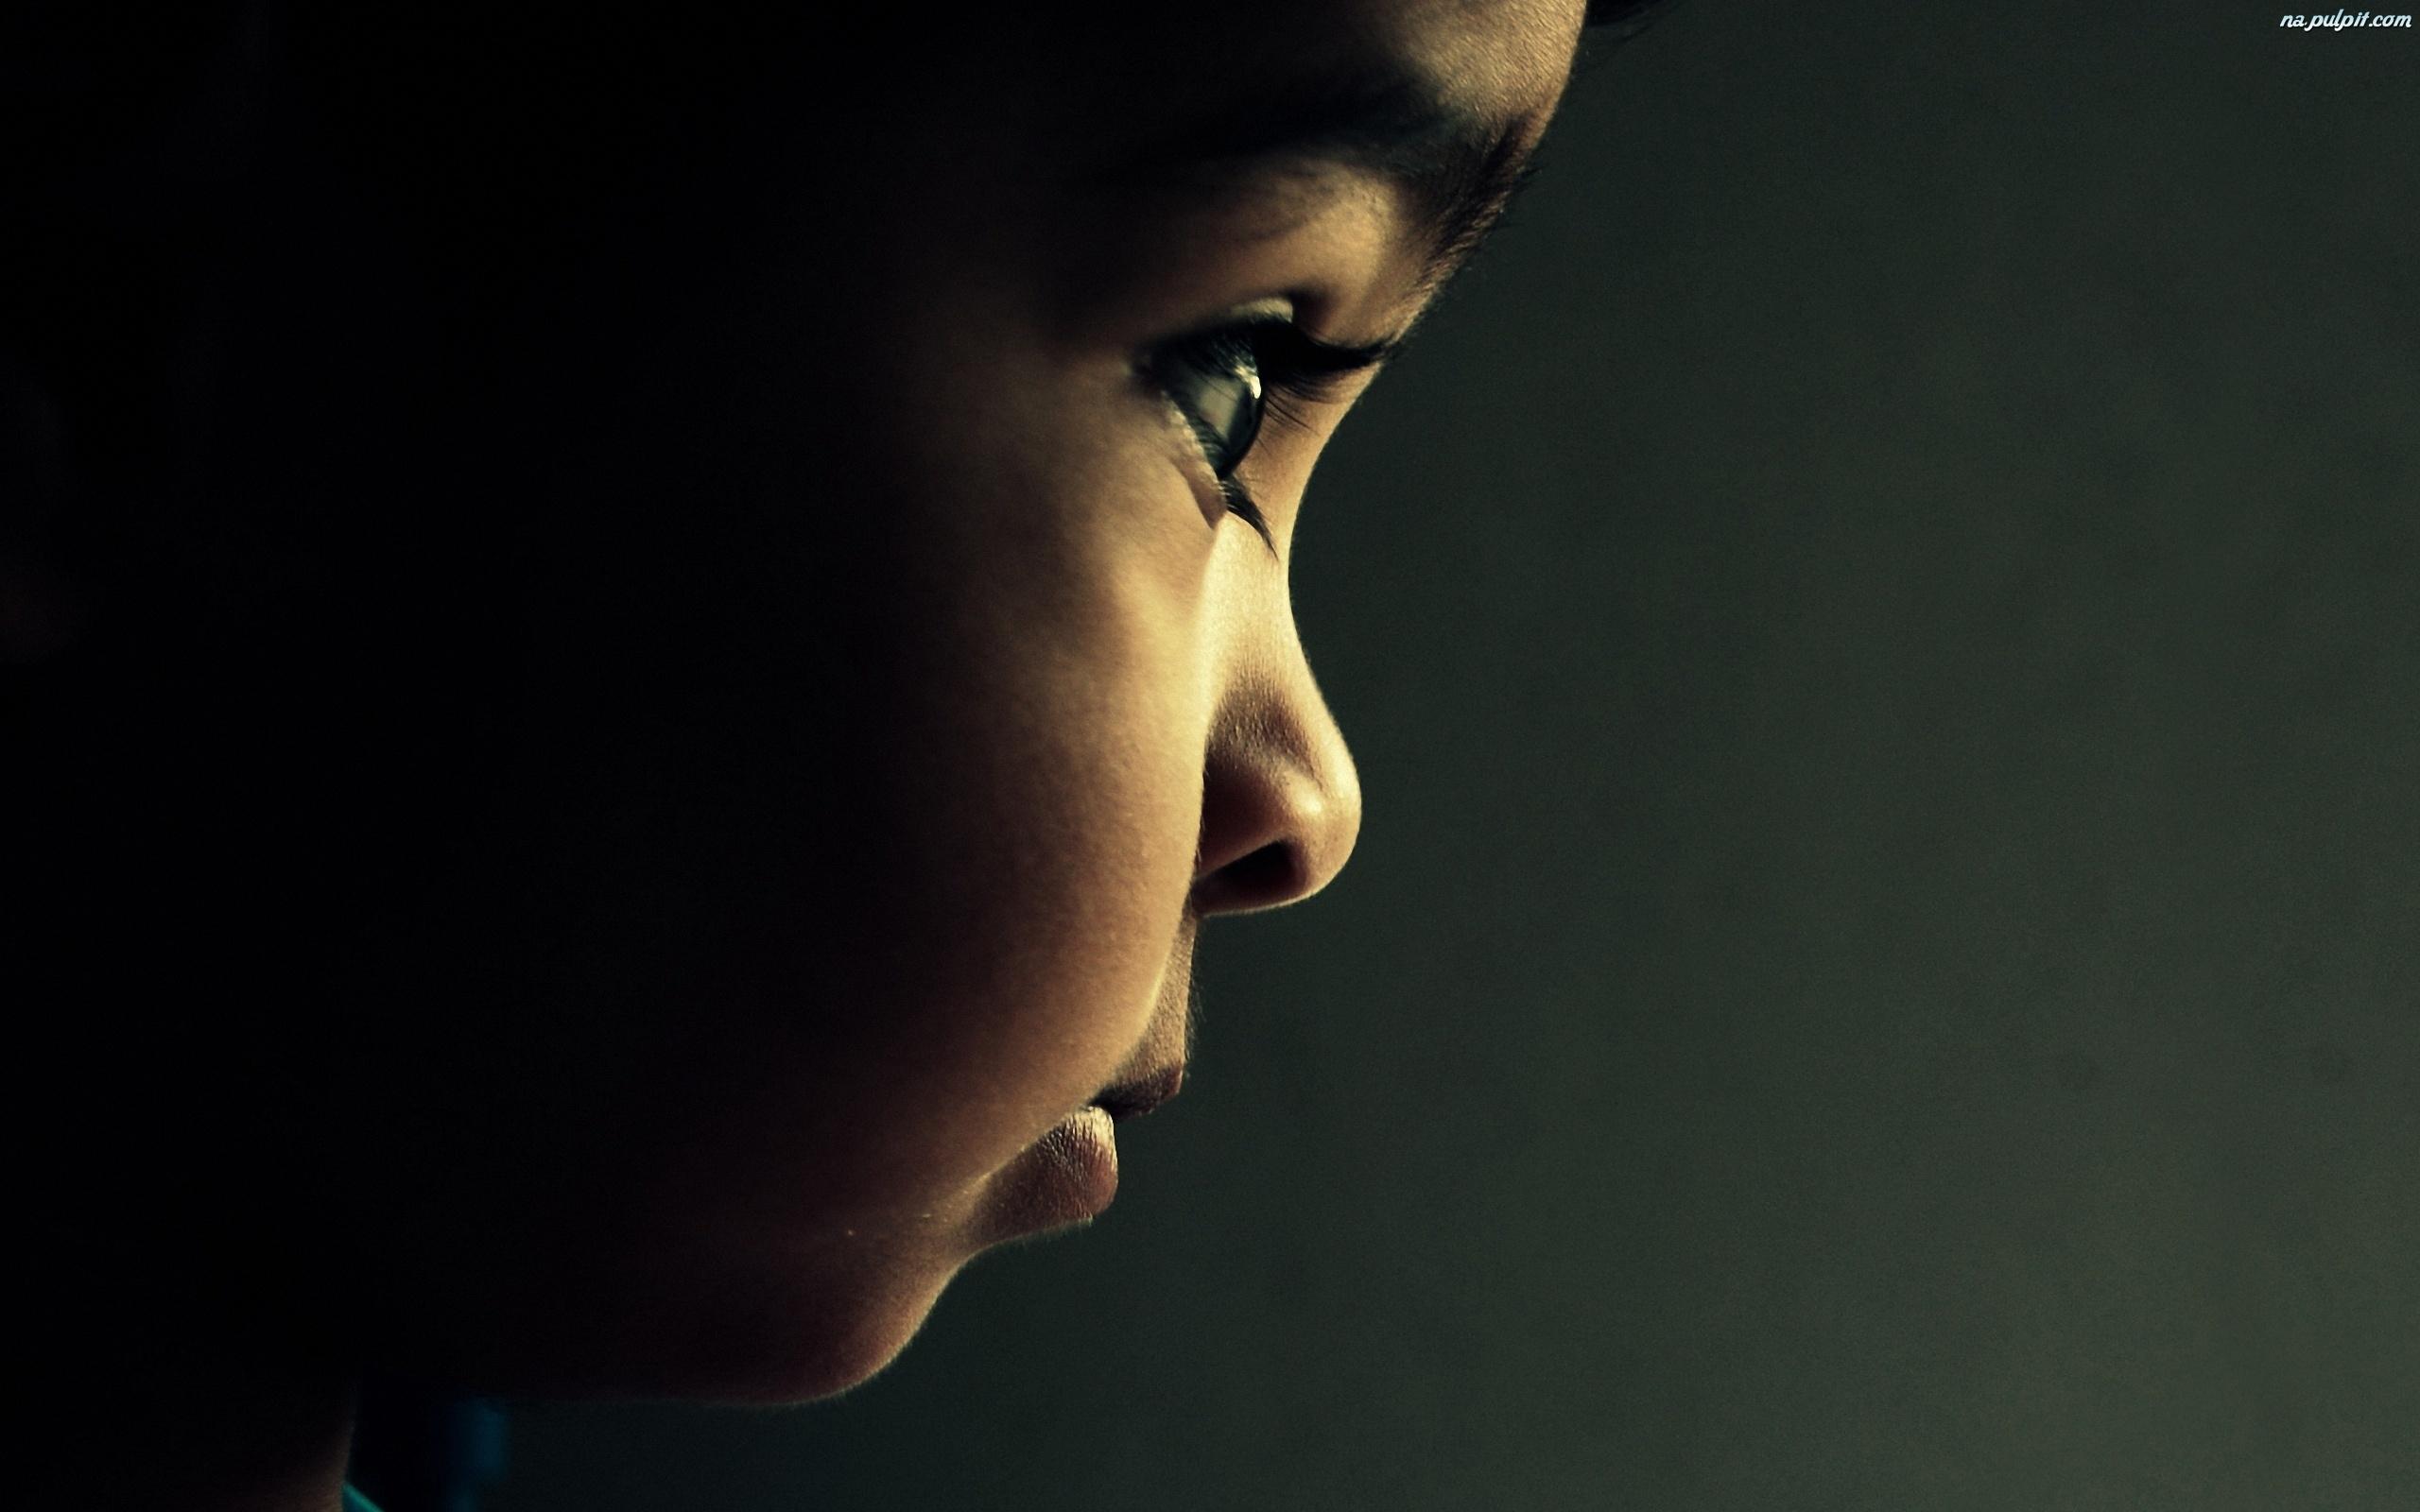 Cute Baby Boys Wallpapers Hd Pictures: Profil, Twarz, Dziecka Na Pulpit